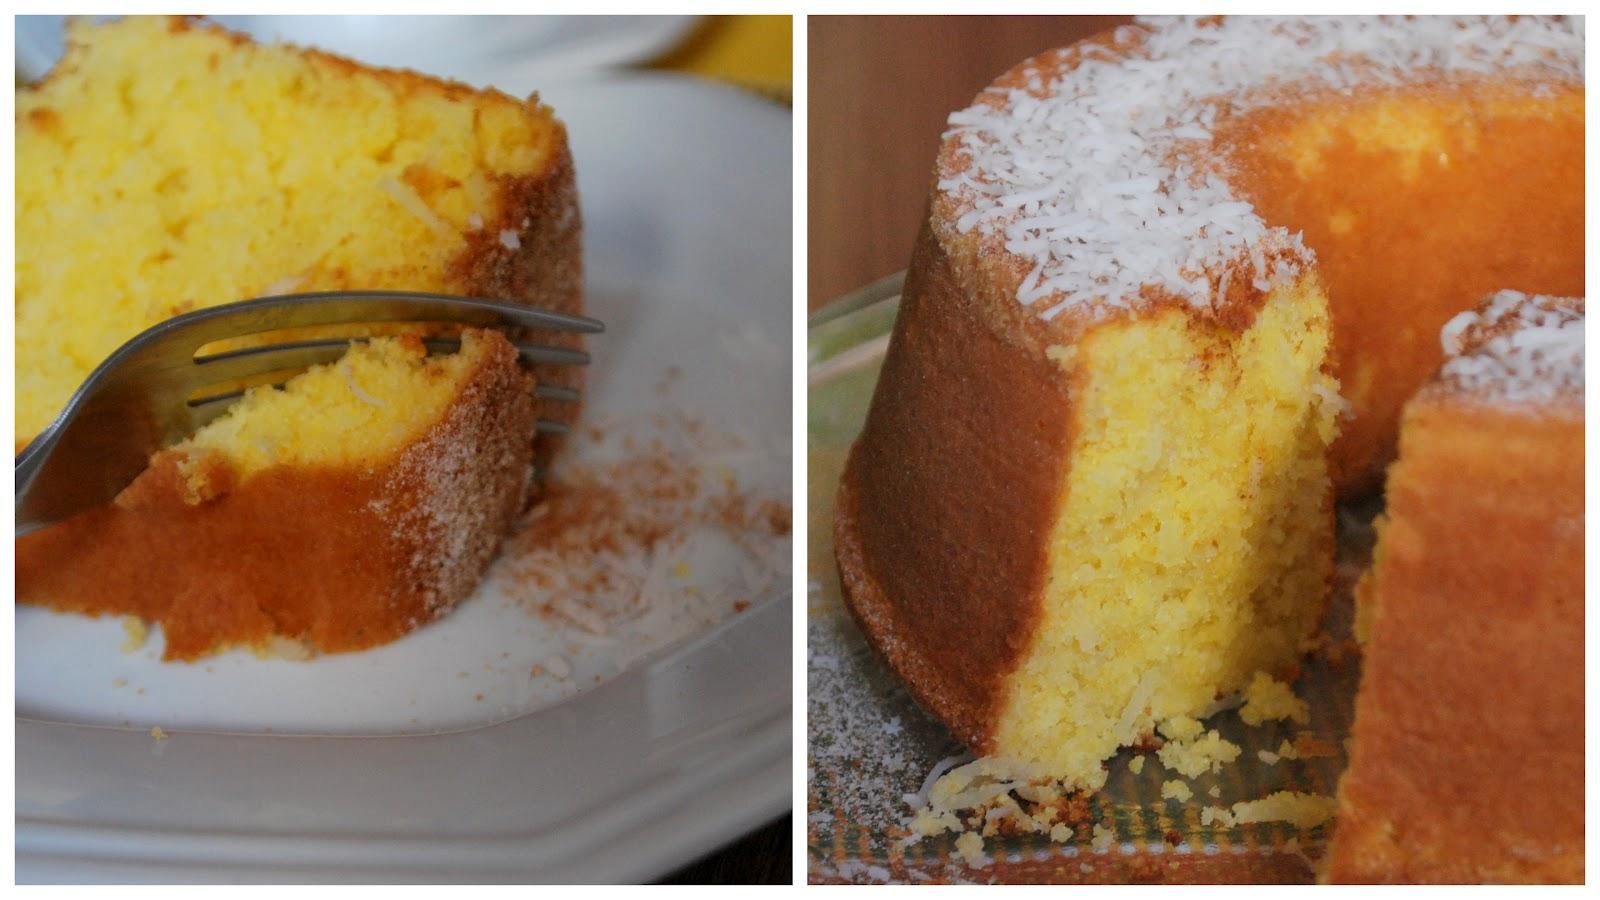 Blogging Foods: Cornmeal and Coconut Cake (Bolo de Fuba com Coco)